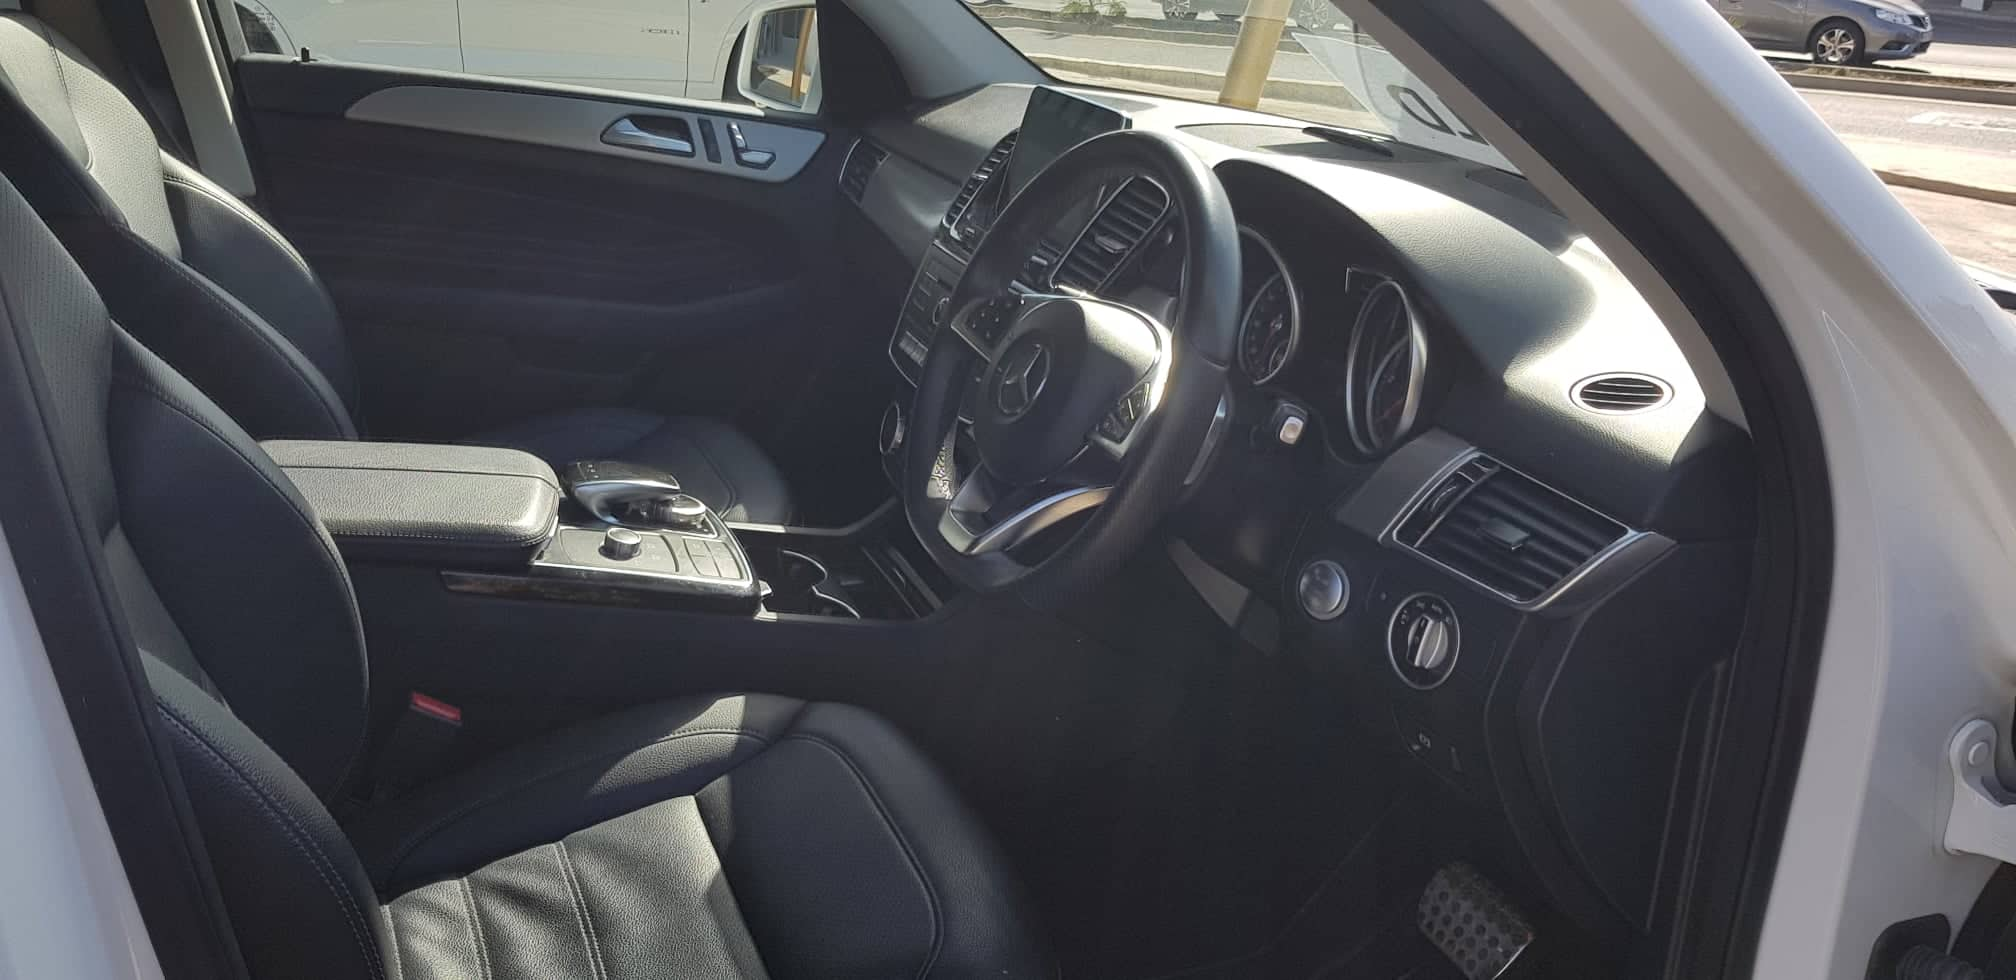 Mercedes Benz GLE 250D Estate 4Matic AMG Line